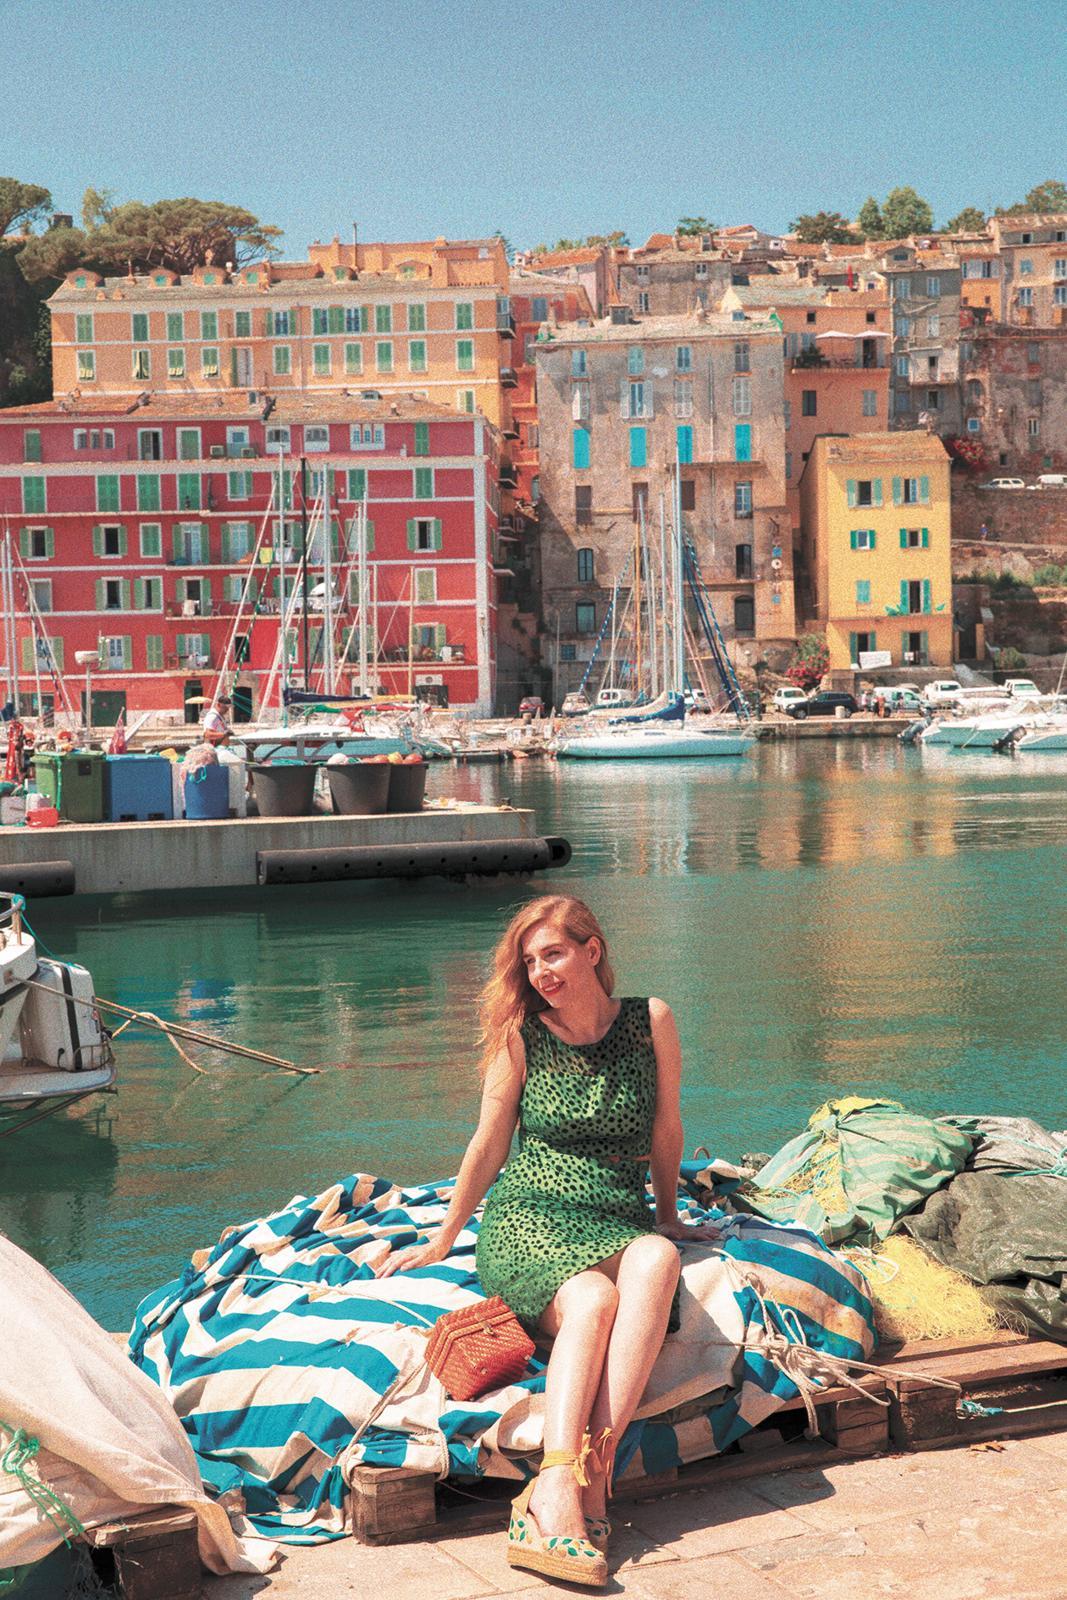 Barbara en Corse (crédit photo Daguin Giamarchi)